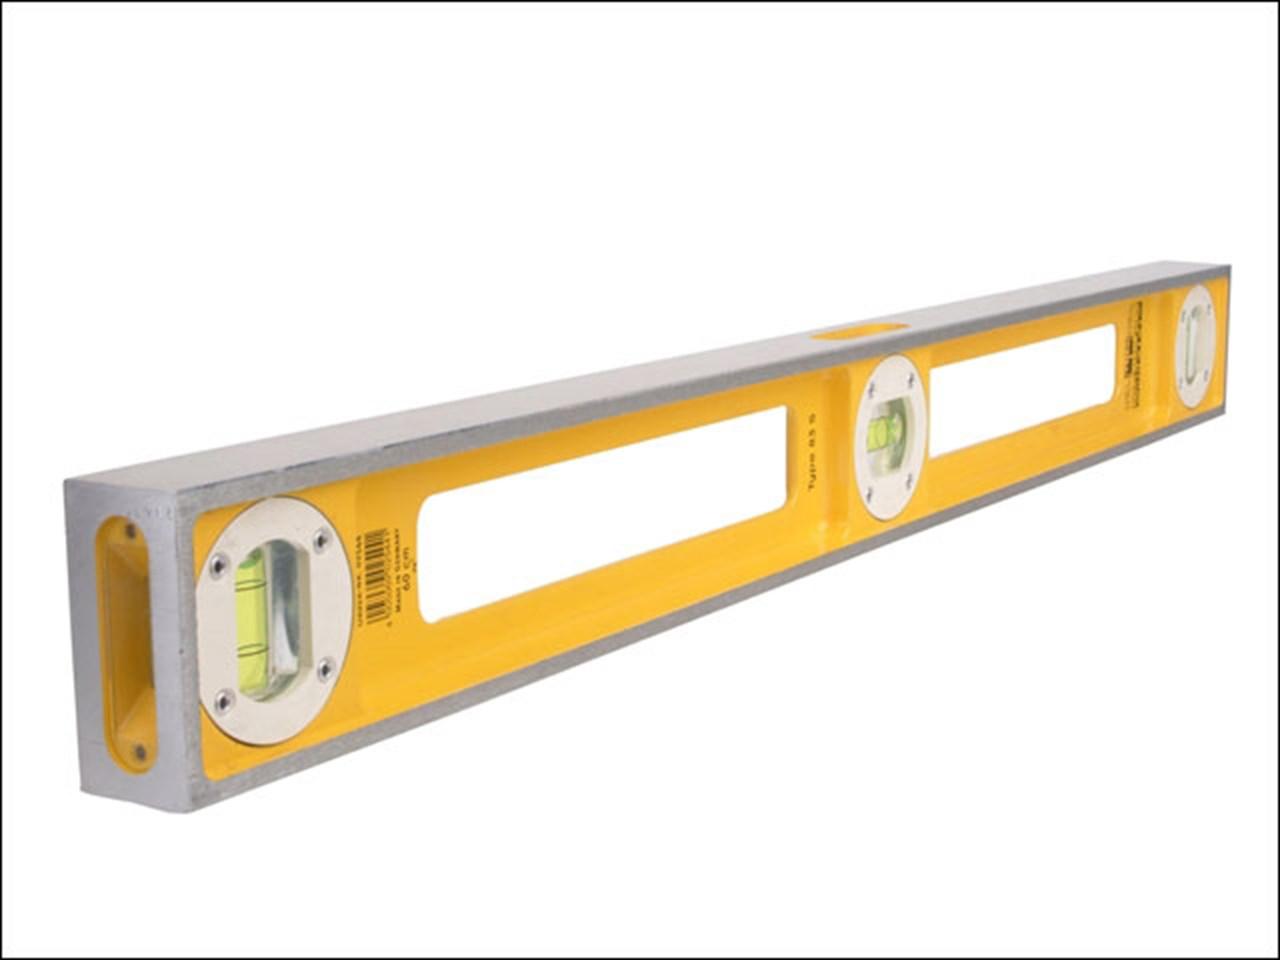 Double Double 100cm : Stabila stb s level double plumb cm mm